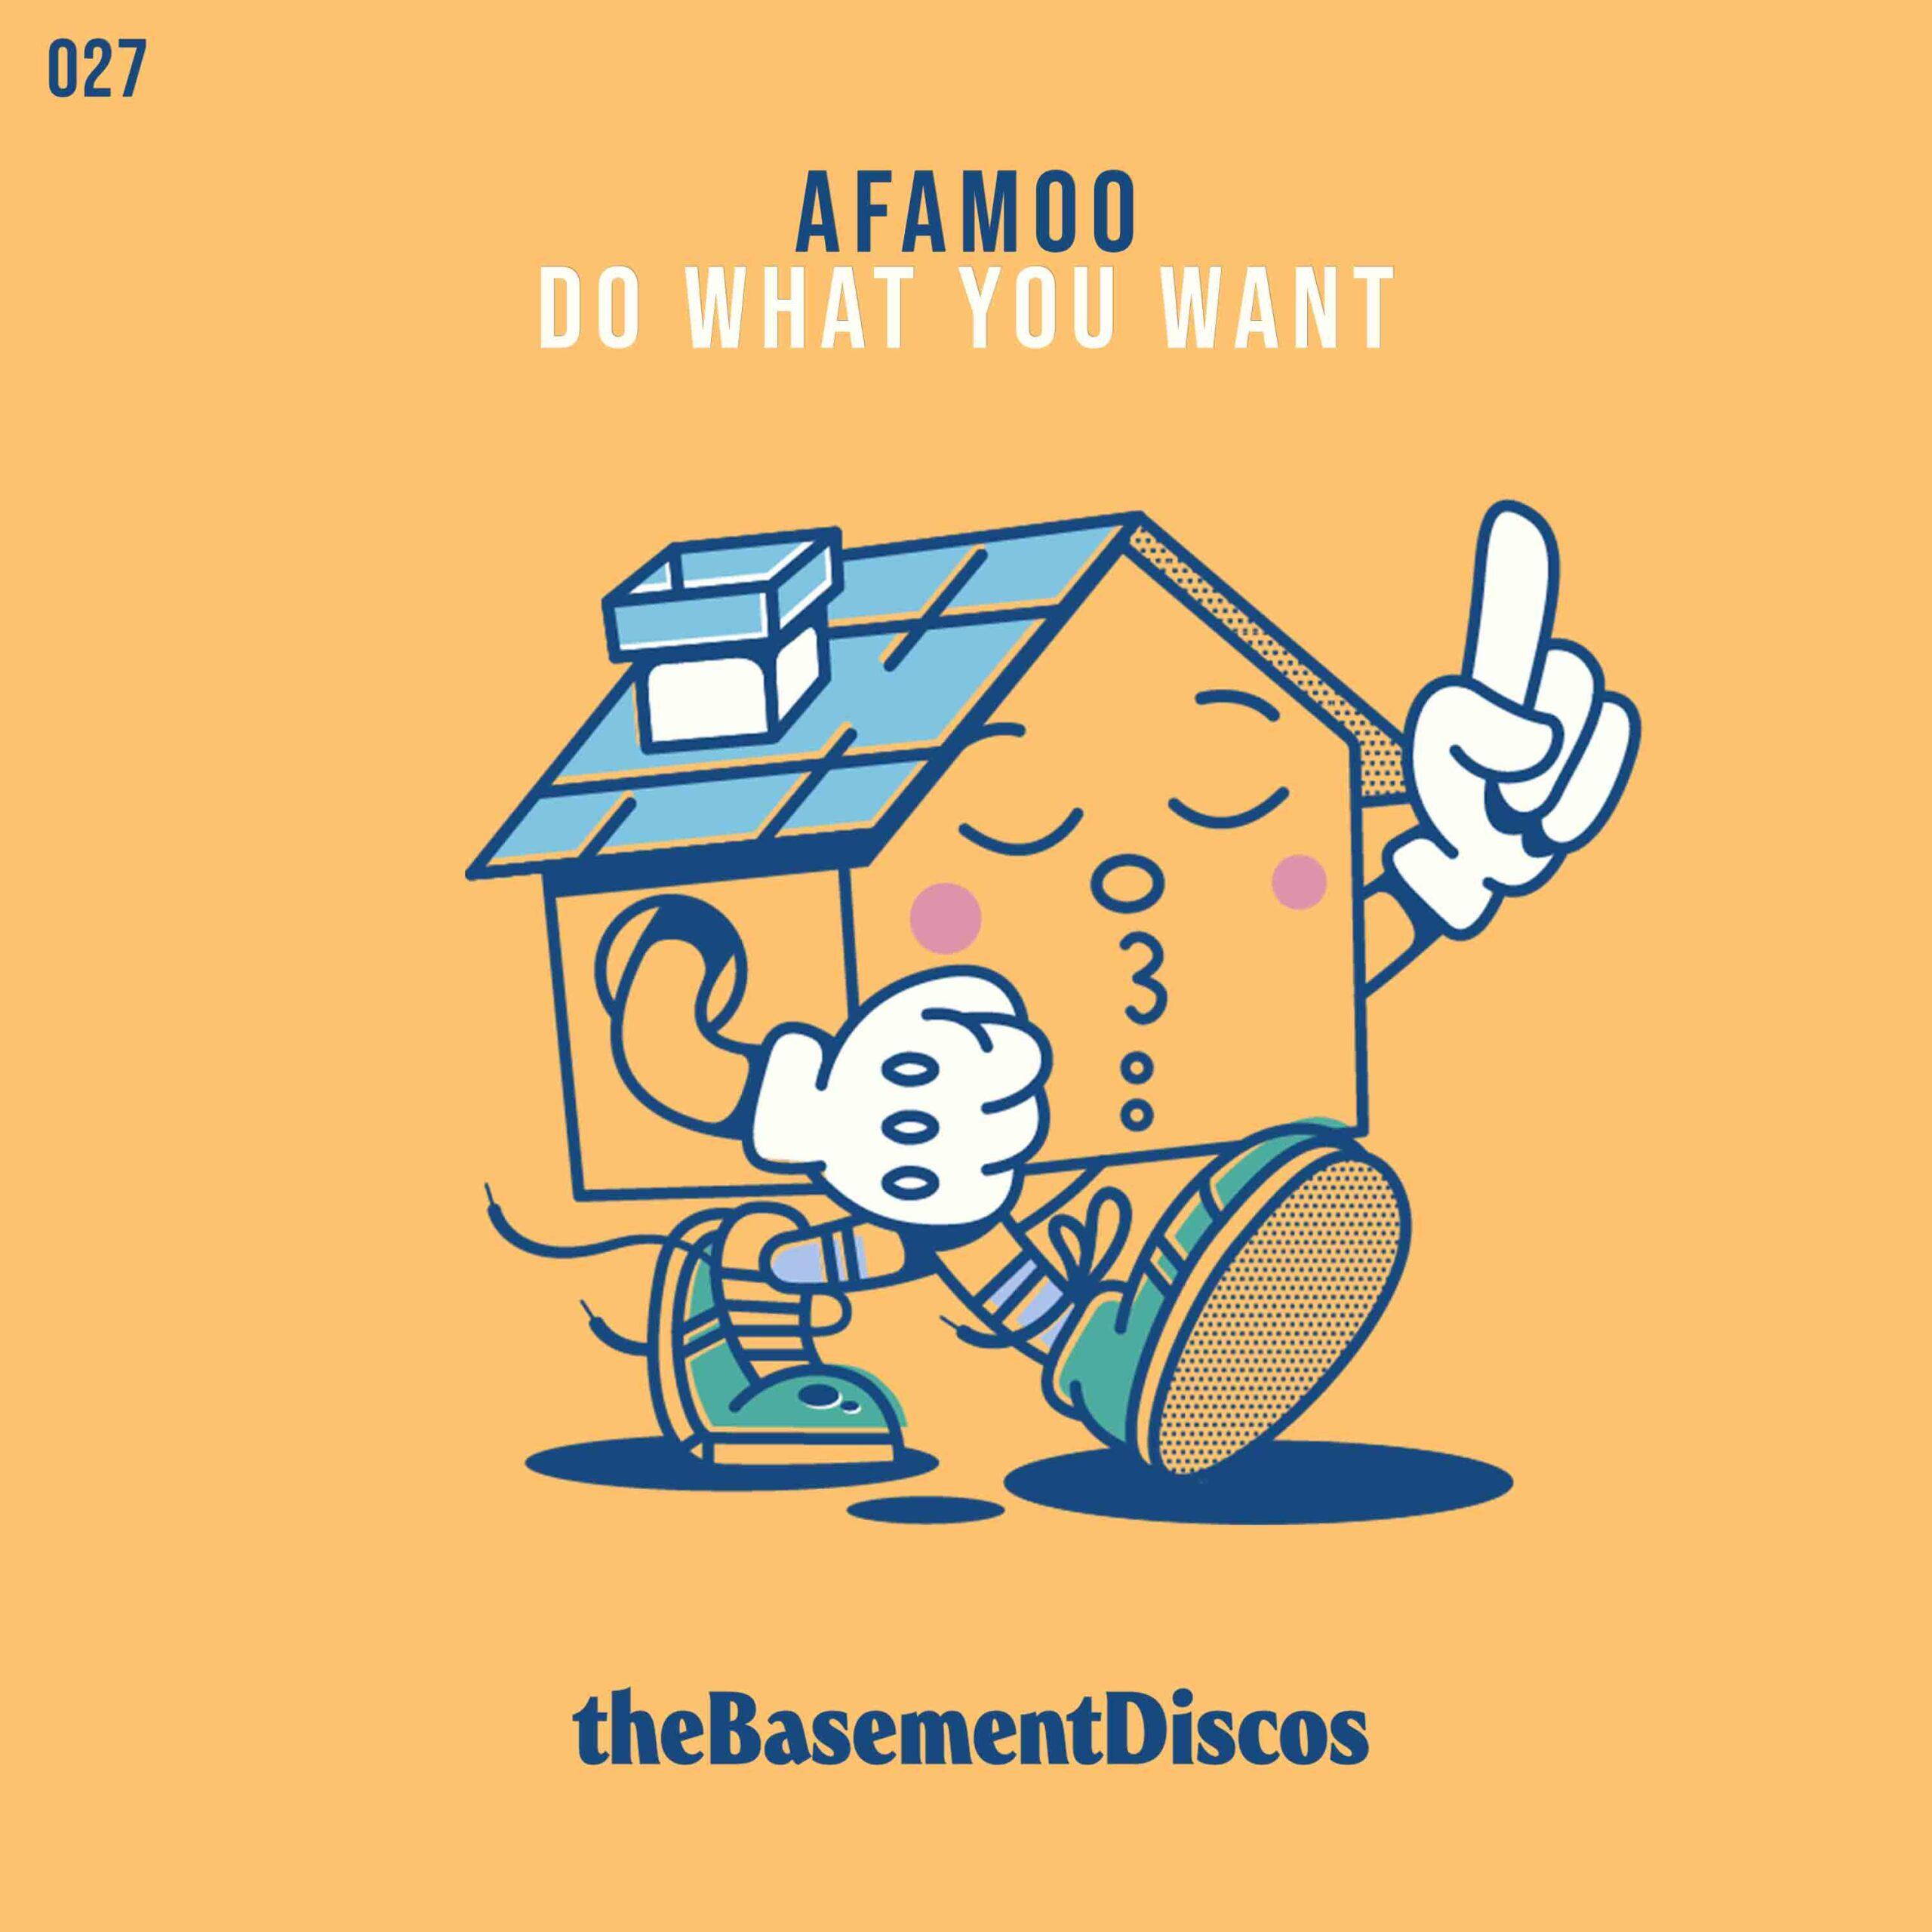 the-basement-thebasement-thebasementdiscos-afamoo-do-what-you-want-valencia-dj-disco-house-good-feelings-portada